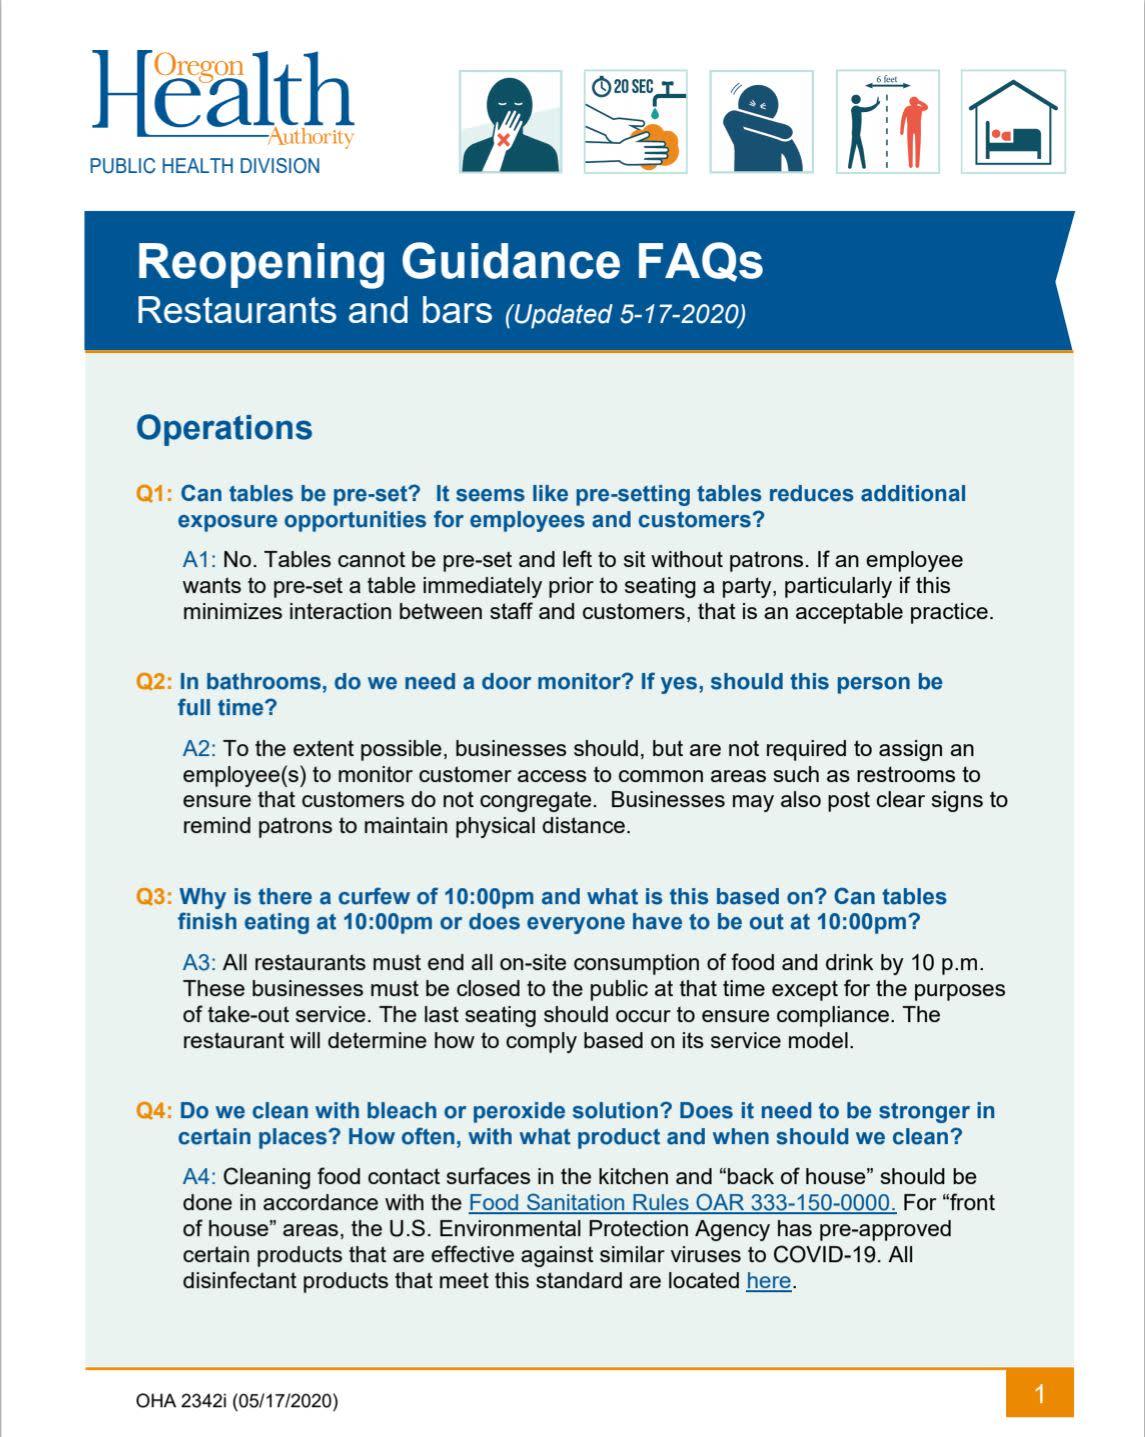 Restaurants & Bars Reopening FAQs